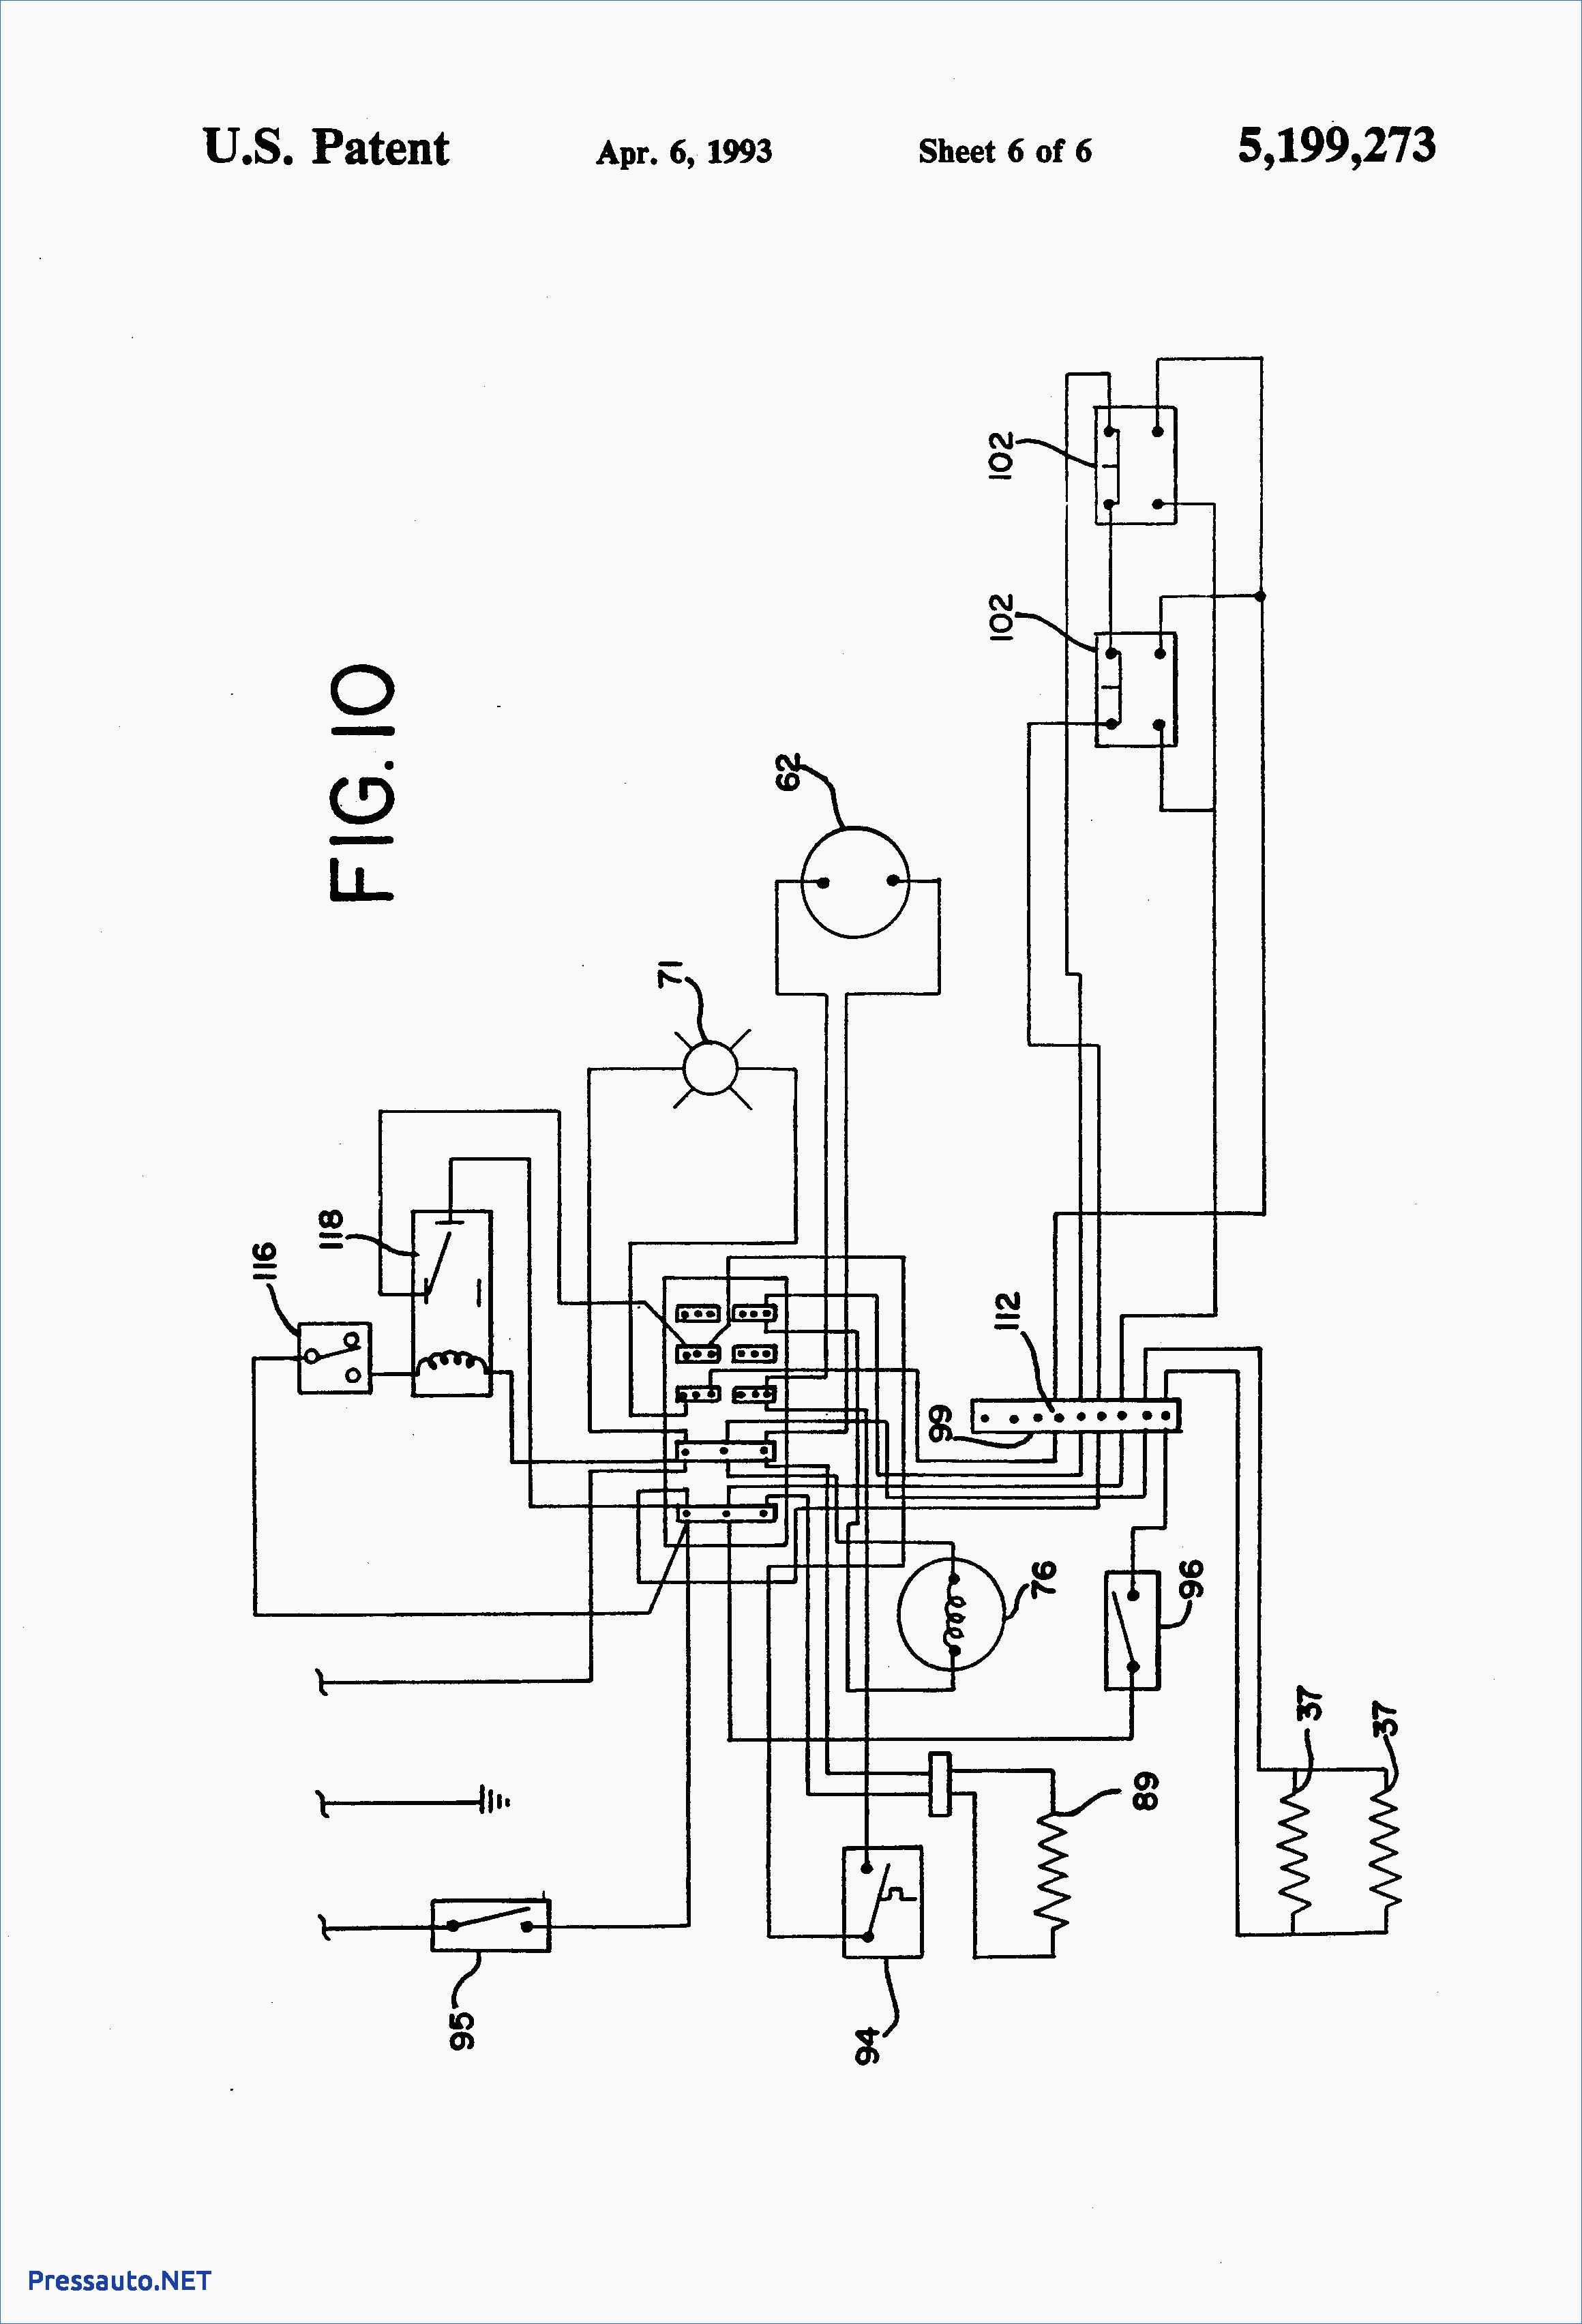 YF_3968] True Refrigerator Gdm 49 Wiring Diagram Download Diagram | True Cooler Wiring Diagrams |  | Sputa Synk Opein Mohammedshrine Librar Wiring 101